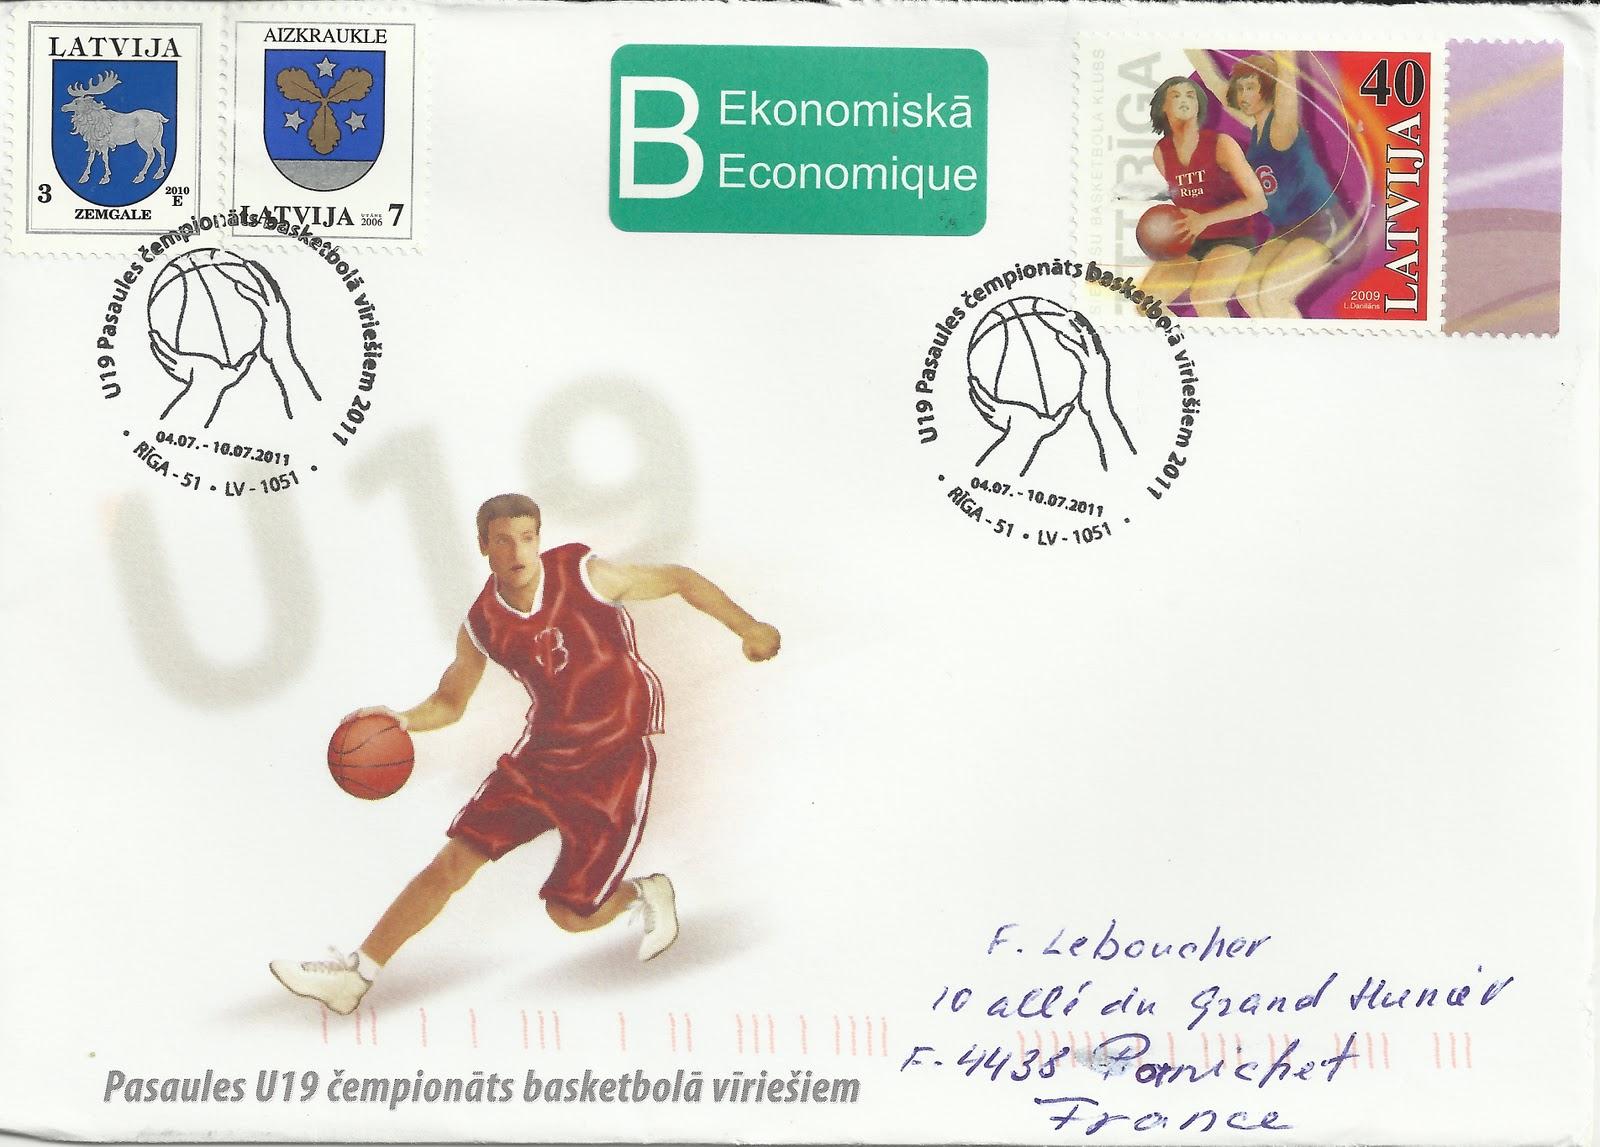 Championnat de Lettonie de basket-ball fminin - Wikimonde